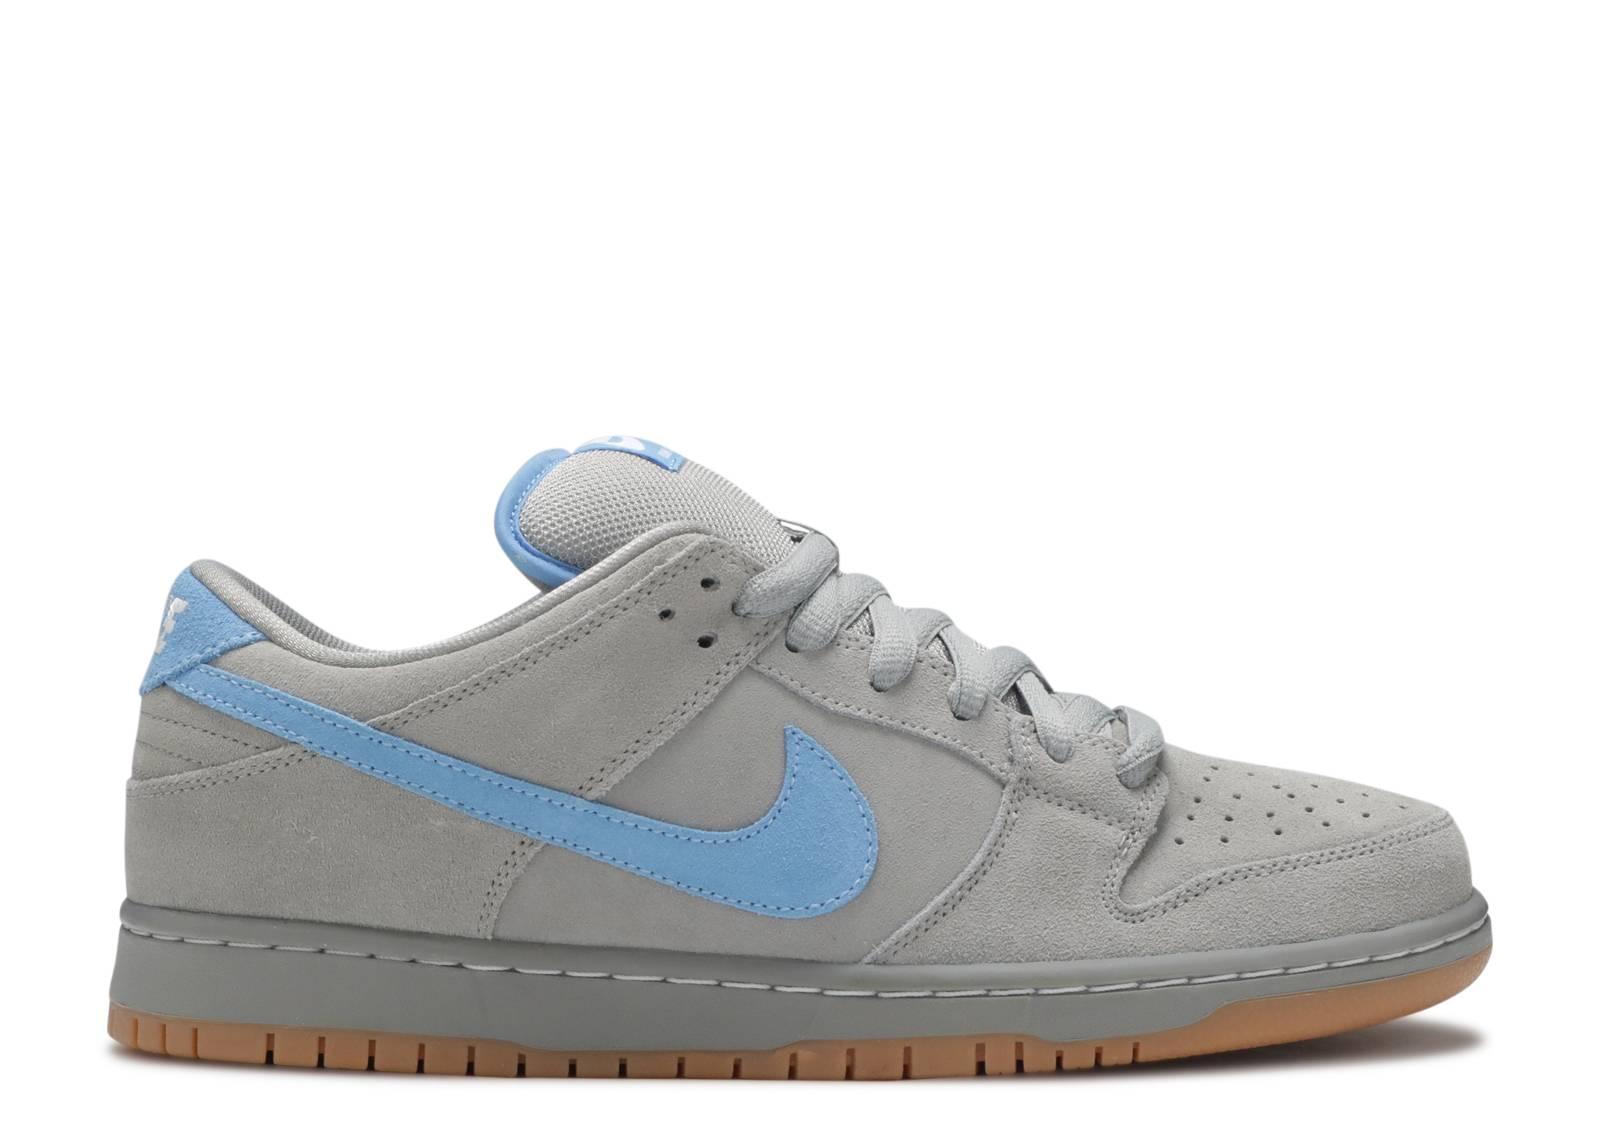 Nike Dunk SB Low Iron Low Sneakers (Medium Grey/University Blue)